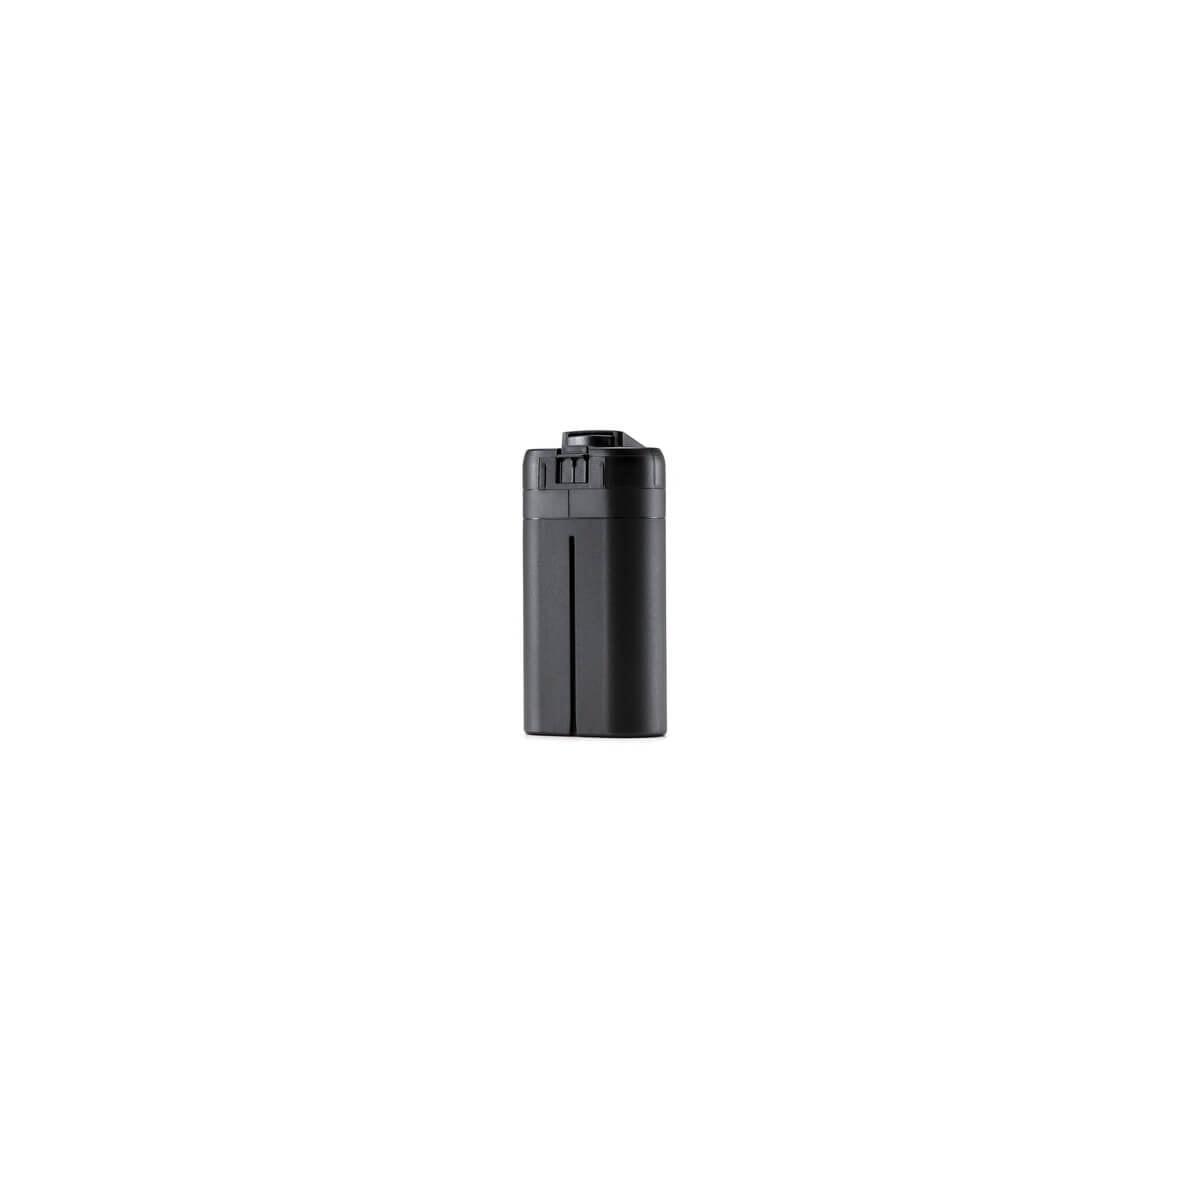 dji-mavic-mini-drono-baterija